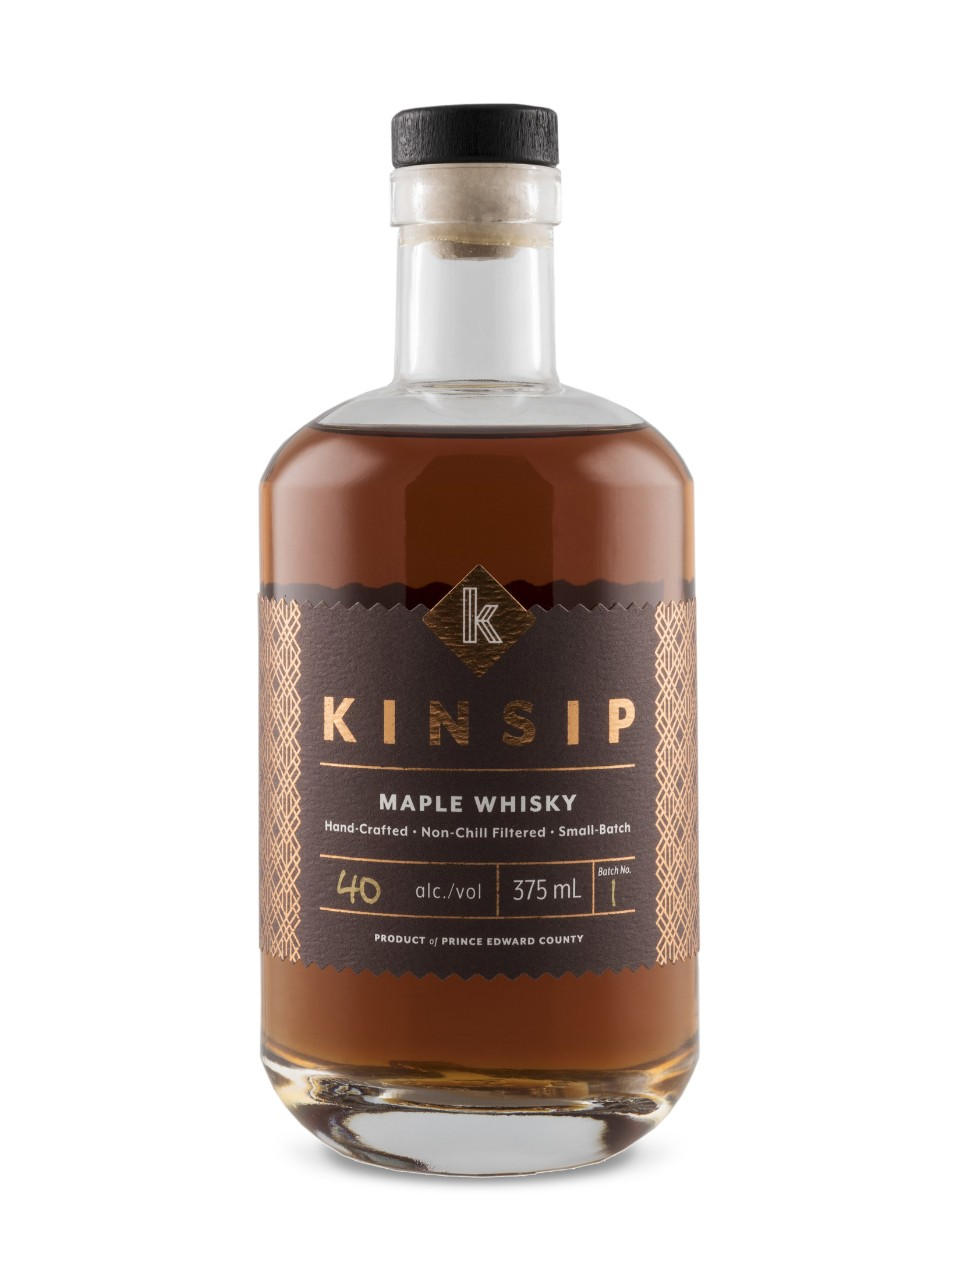 Kinsip Maple Whisky  LCBO